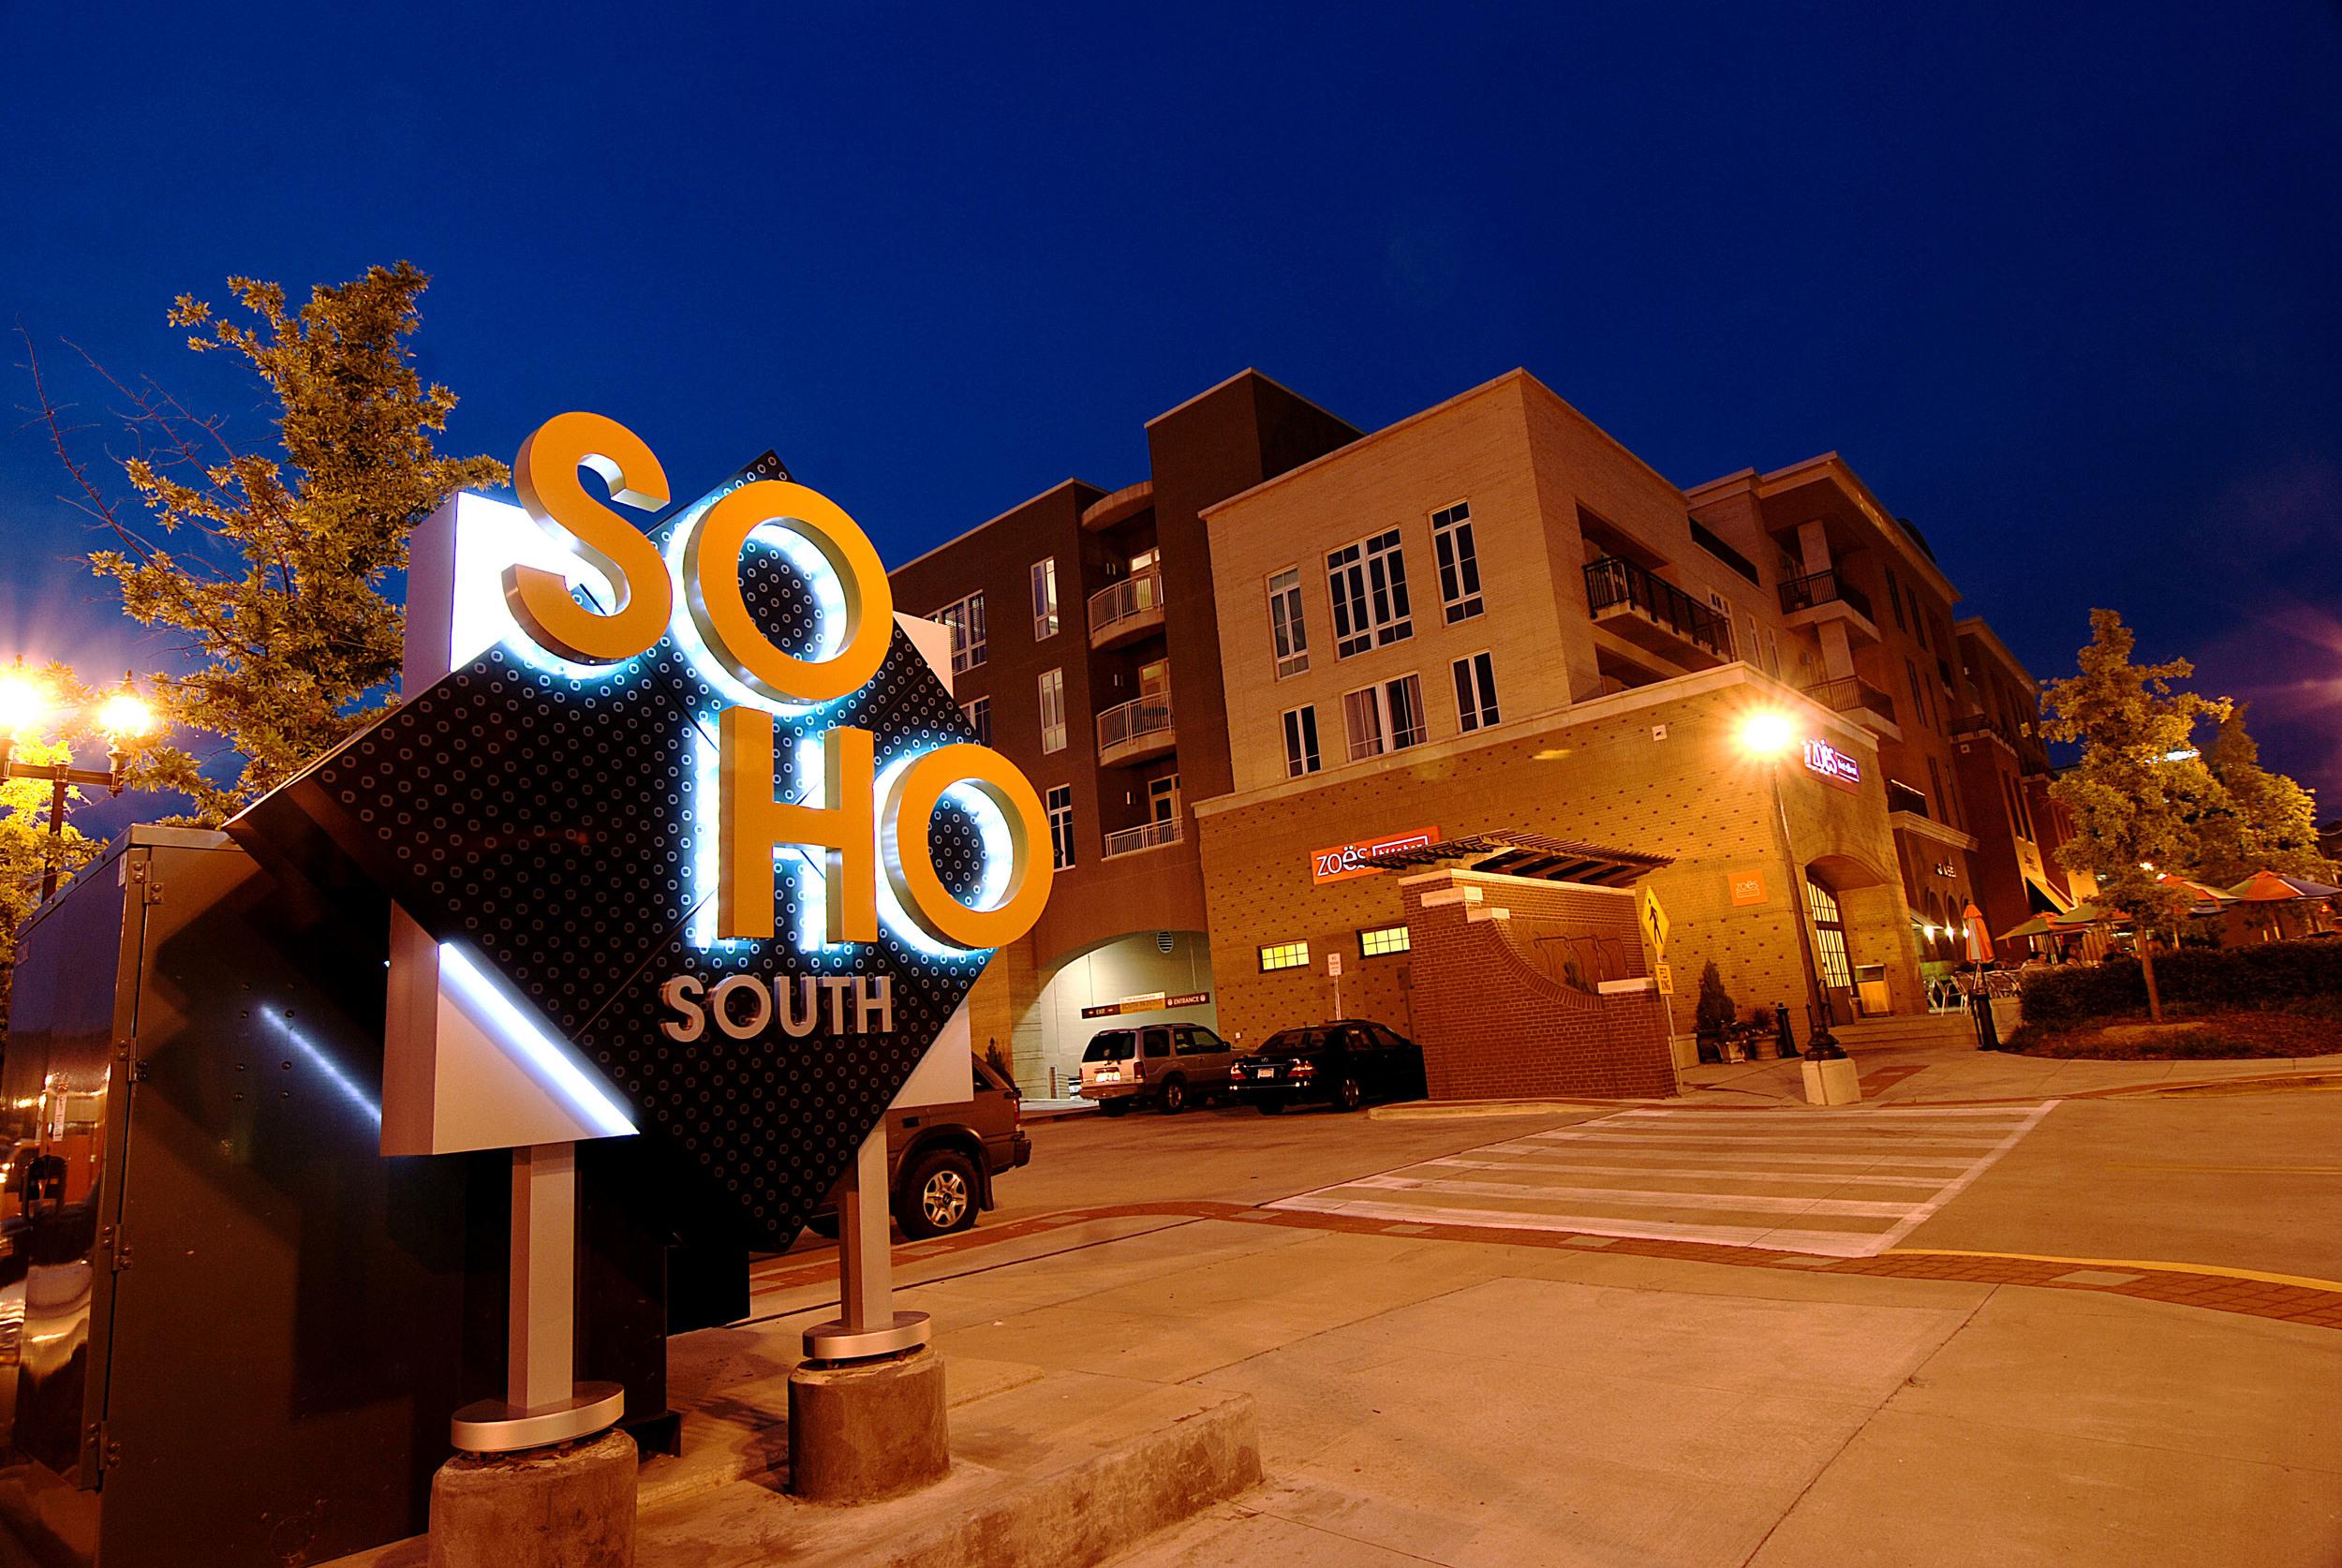 SOHO - Homewood, AL